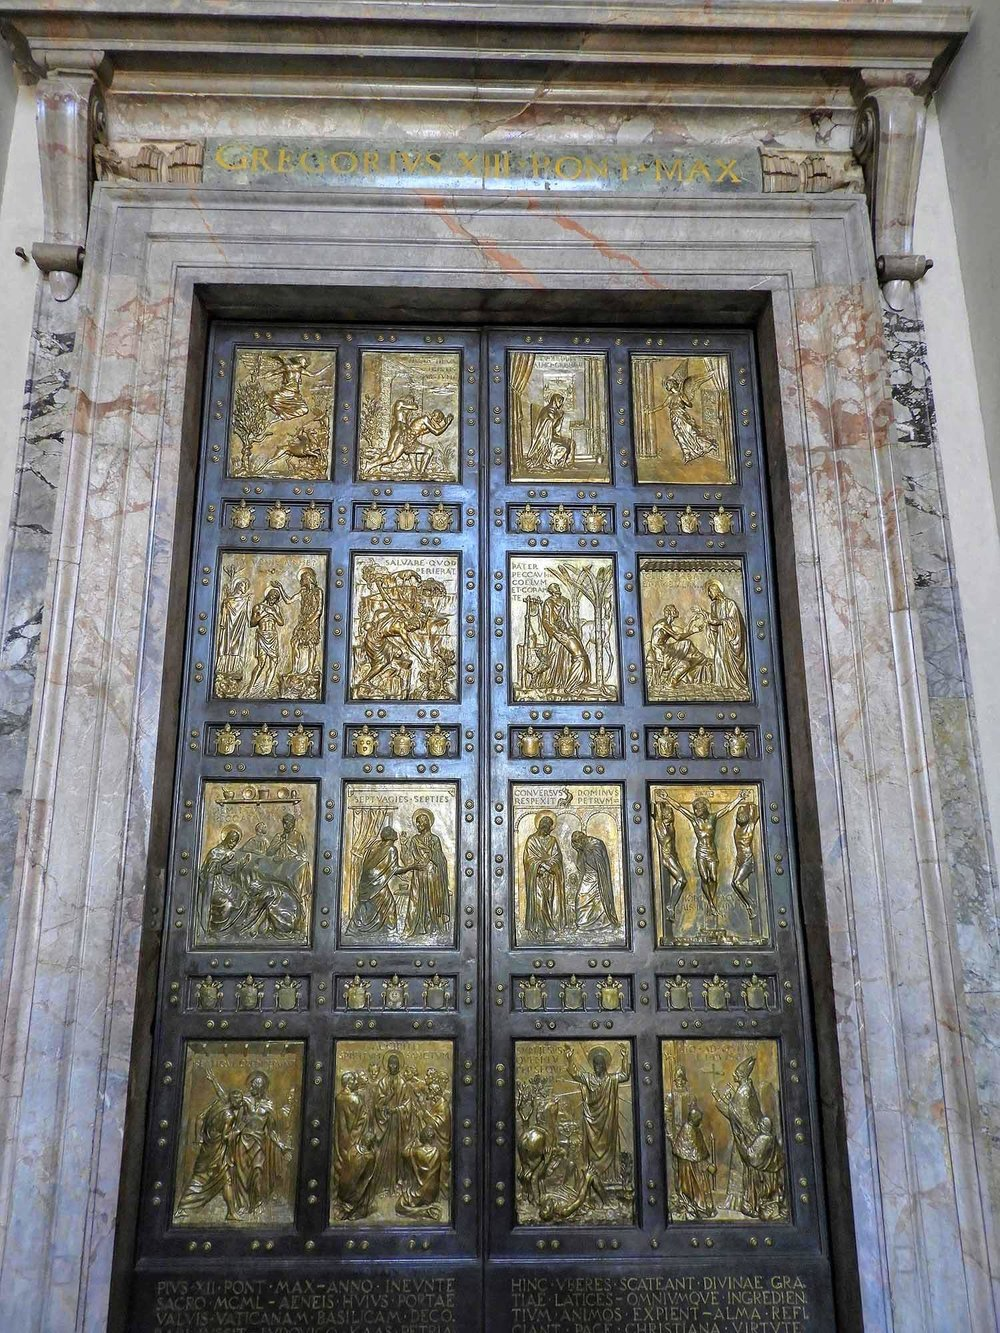 vatican-city-holy-see-italy-italia-rome-bronze doors-life-christ.jpg